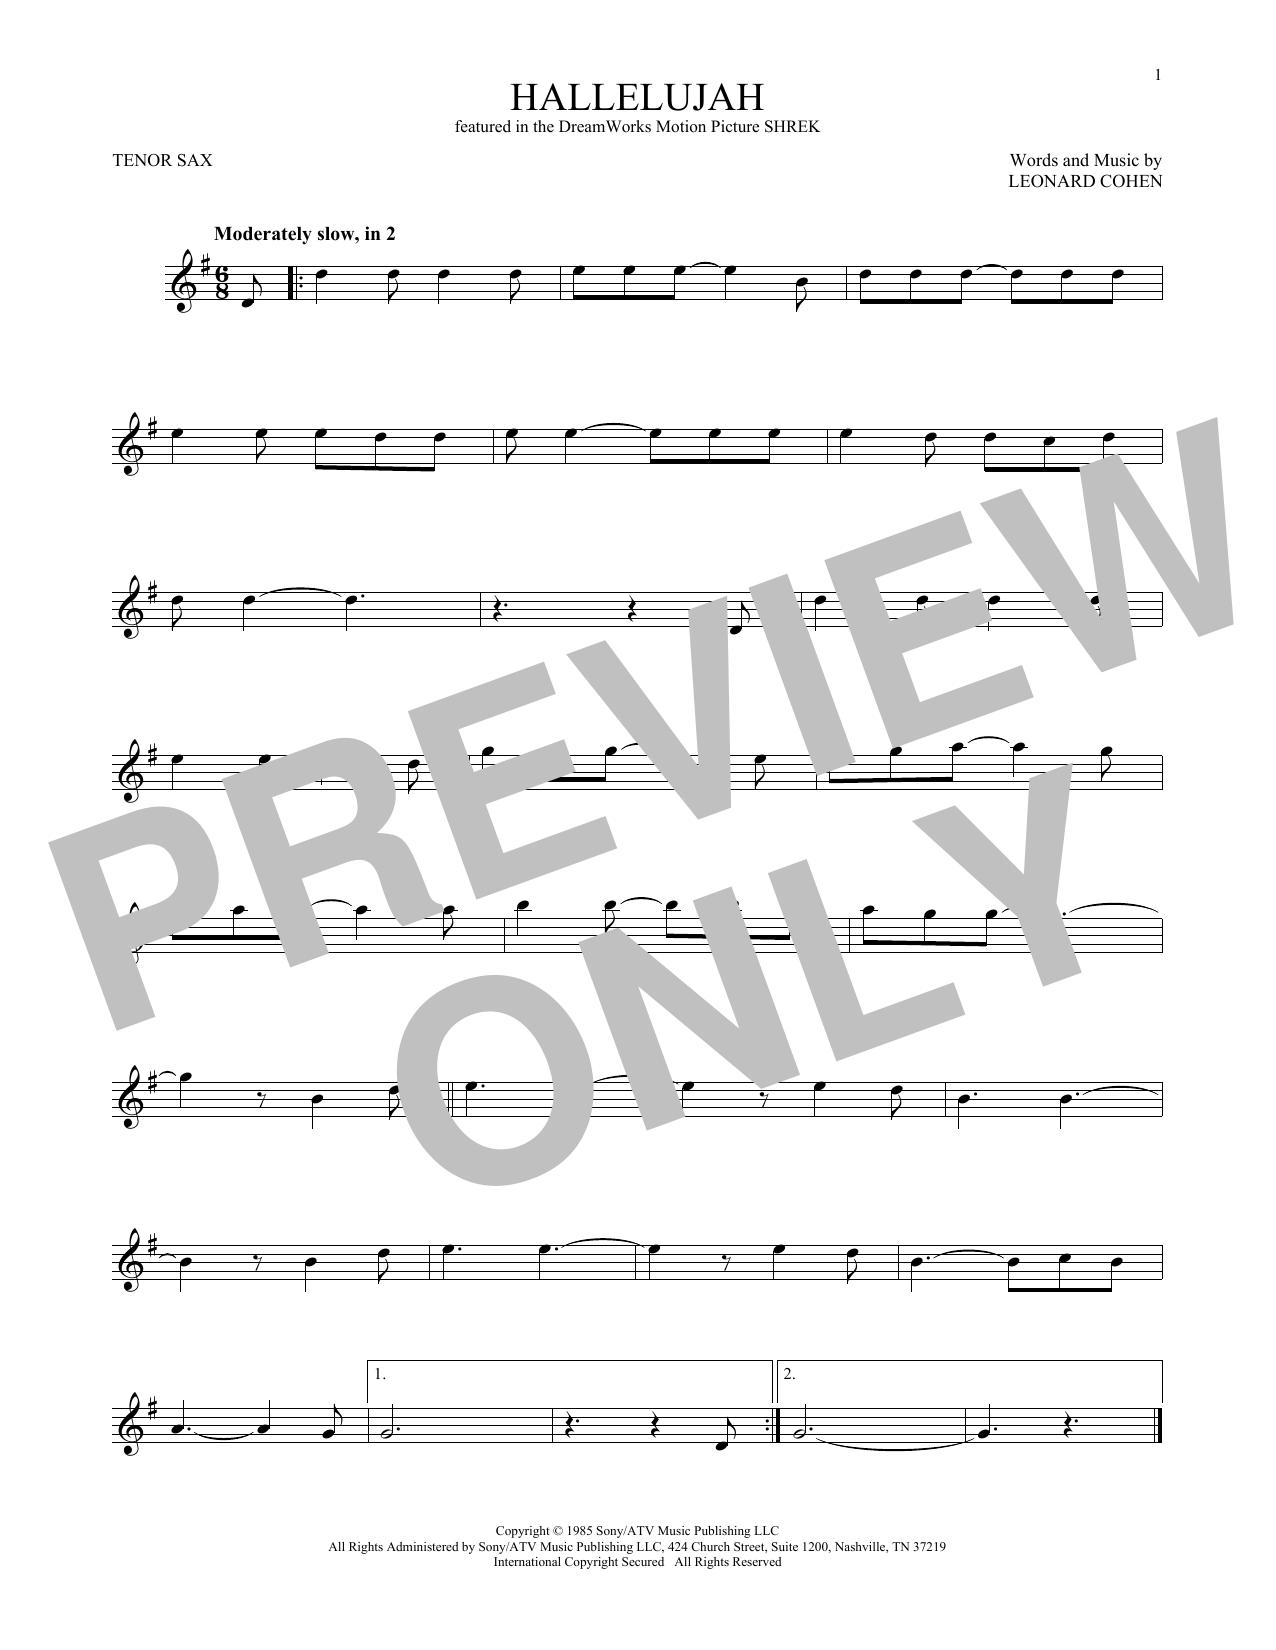 Hallelujah (Tenor Sax Solo)